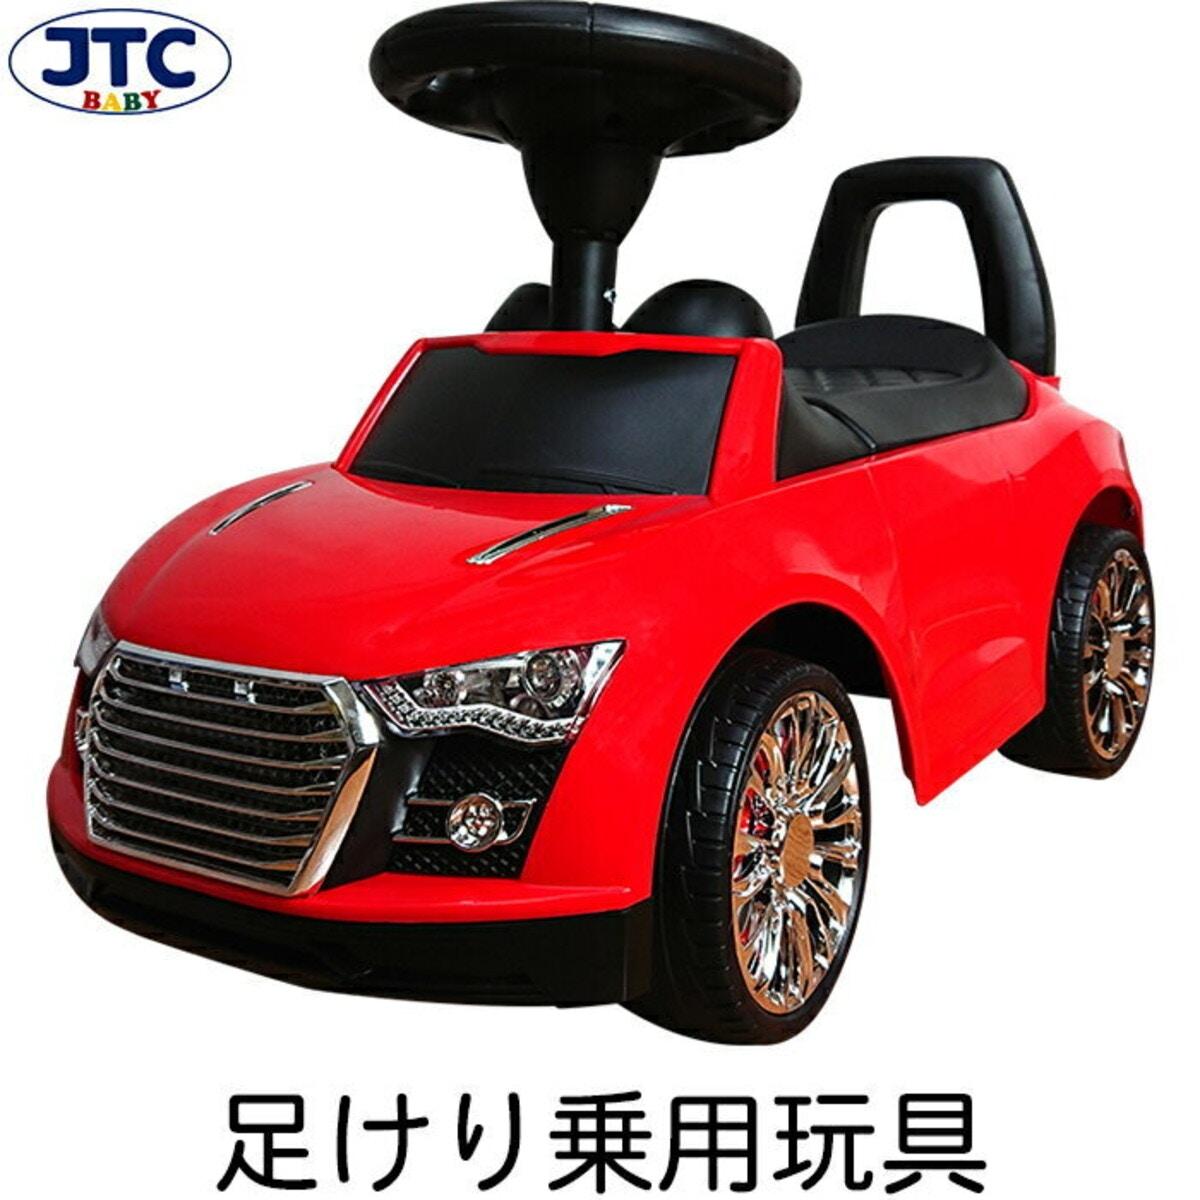 JTC RIDE ON CAR